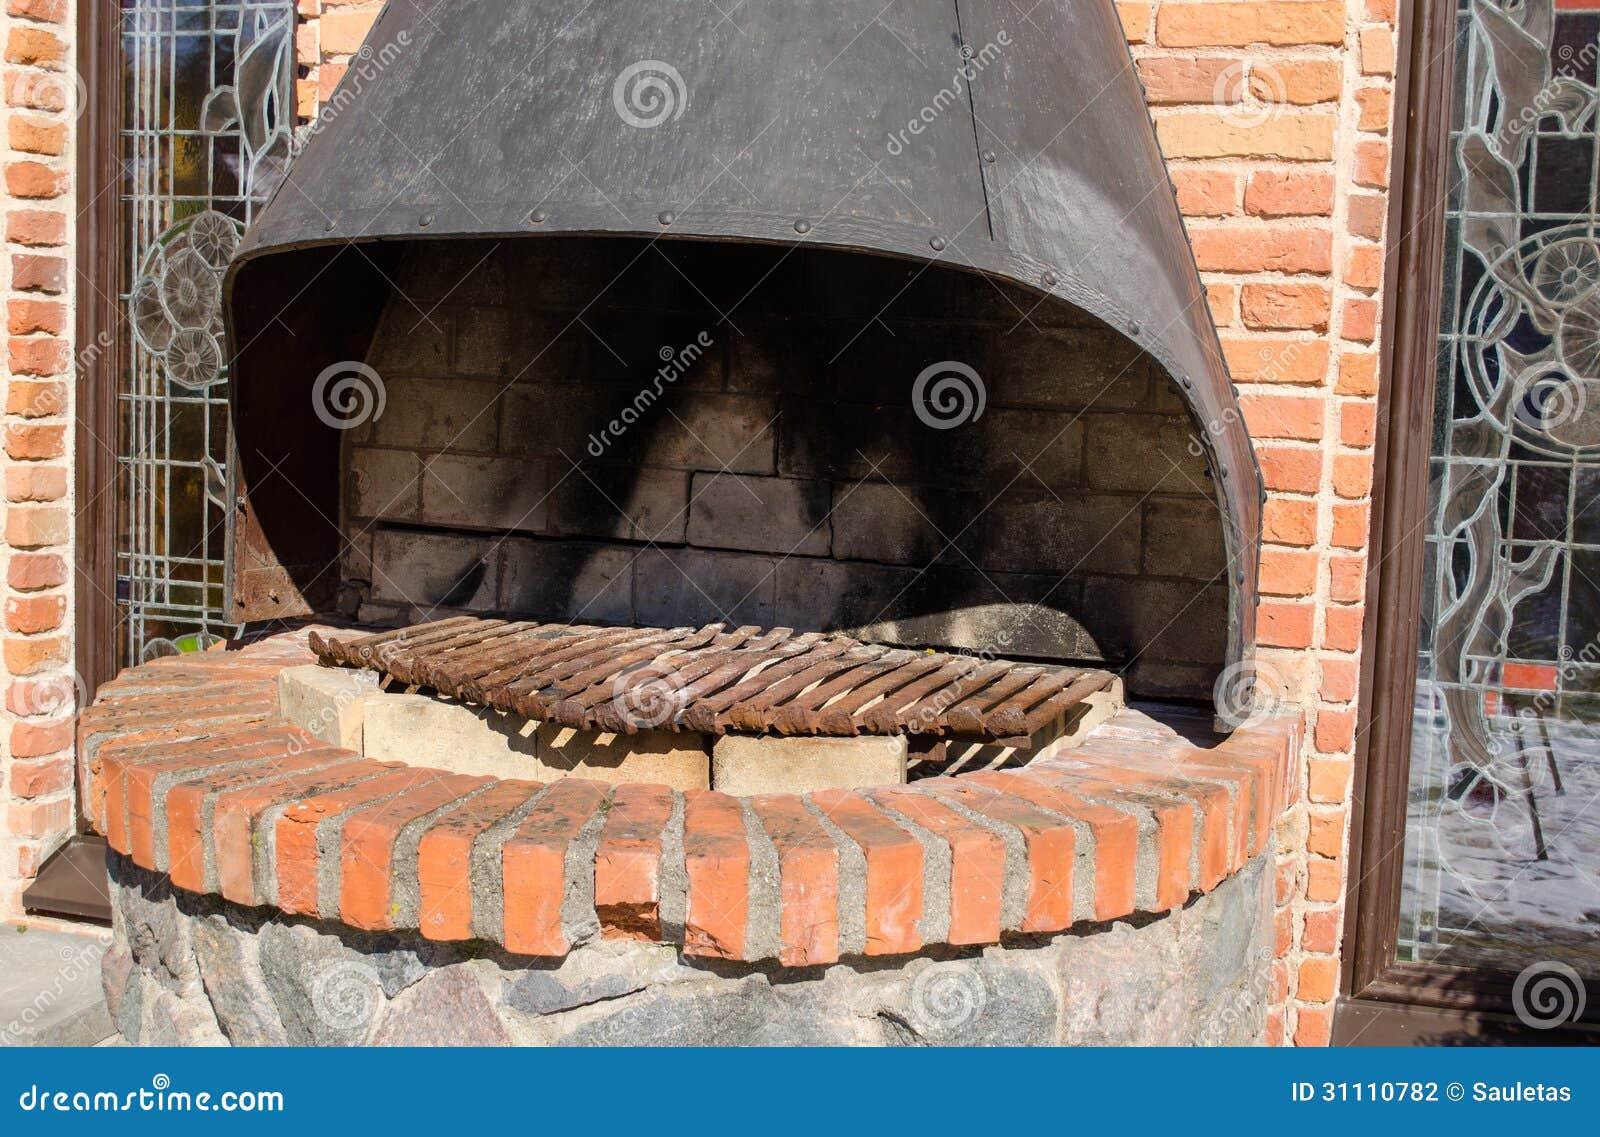 Retro hearth fireplace brick wall outdoor closeup stock for Foyer brique exterieur